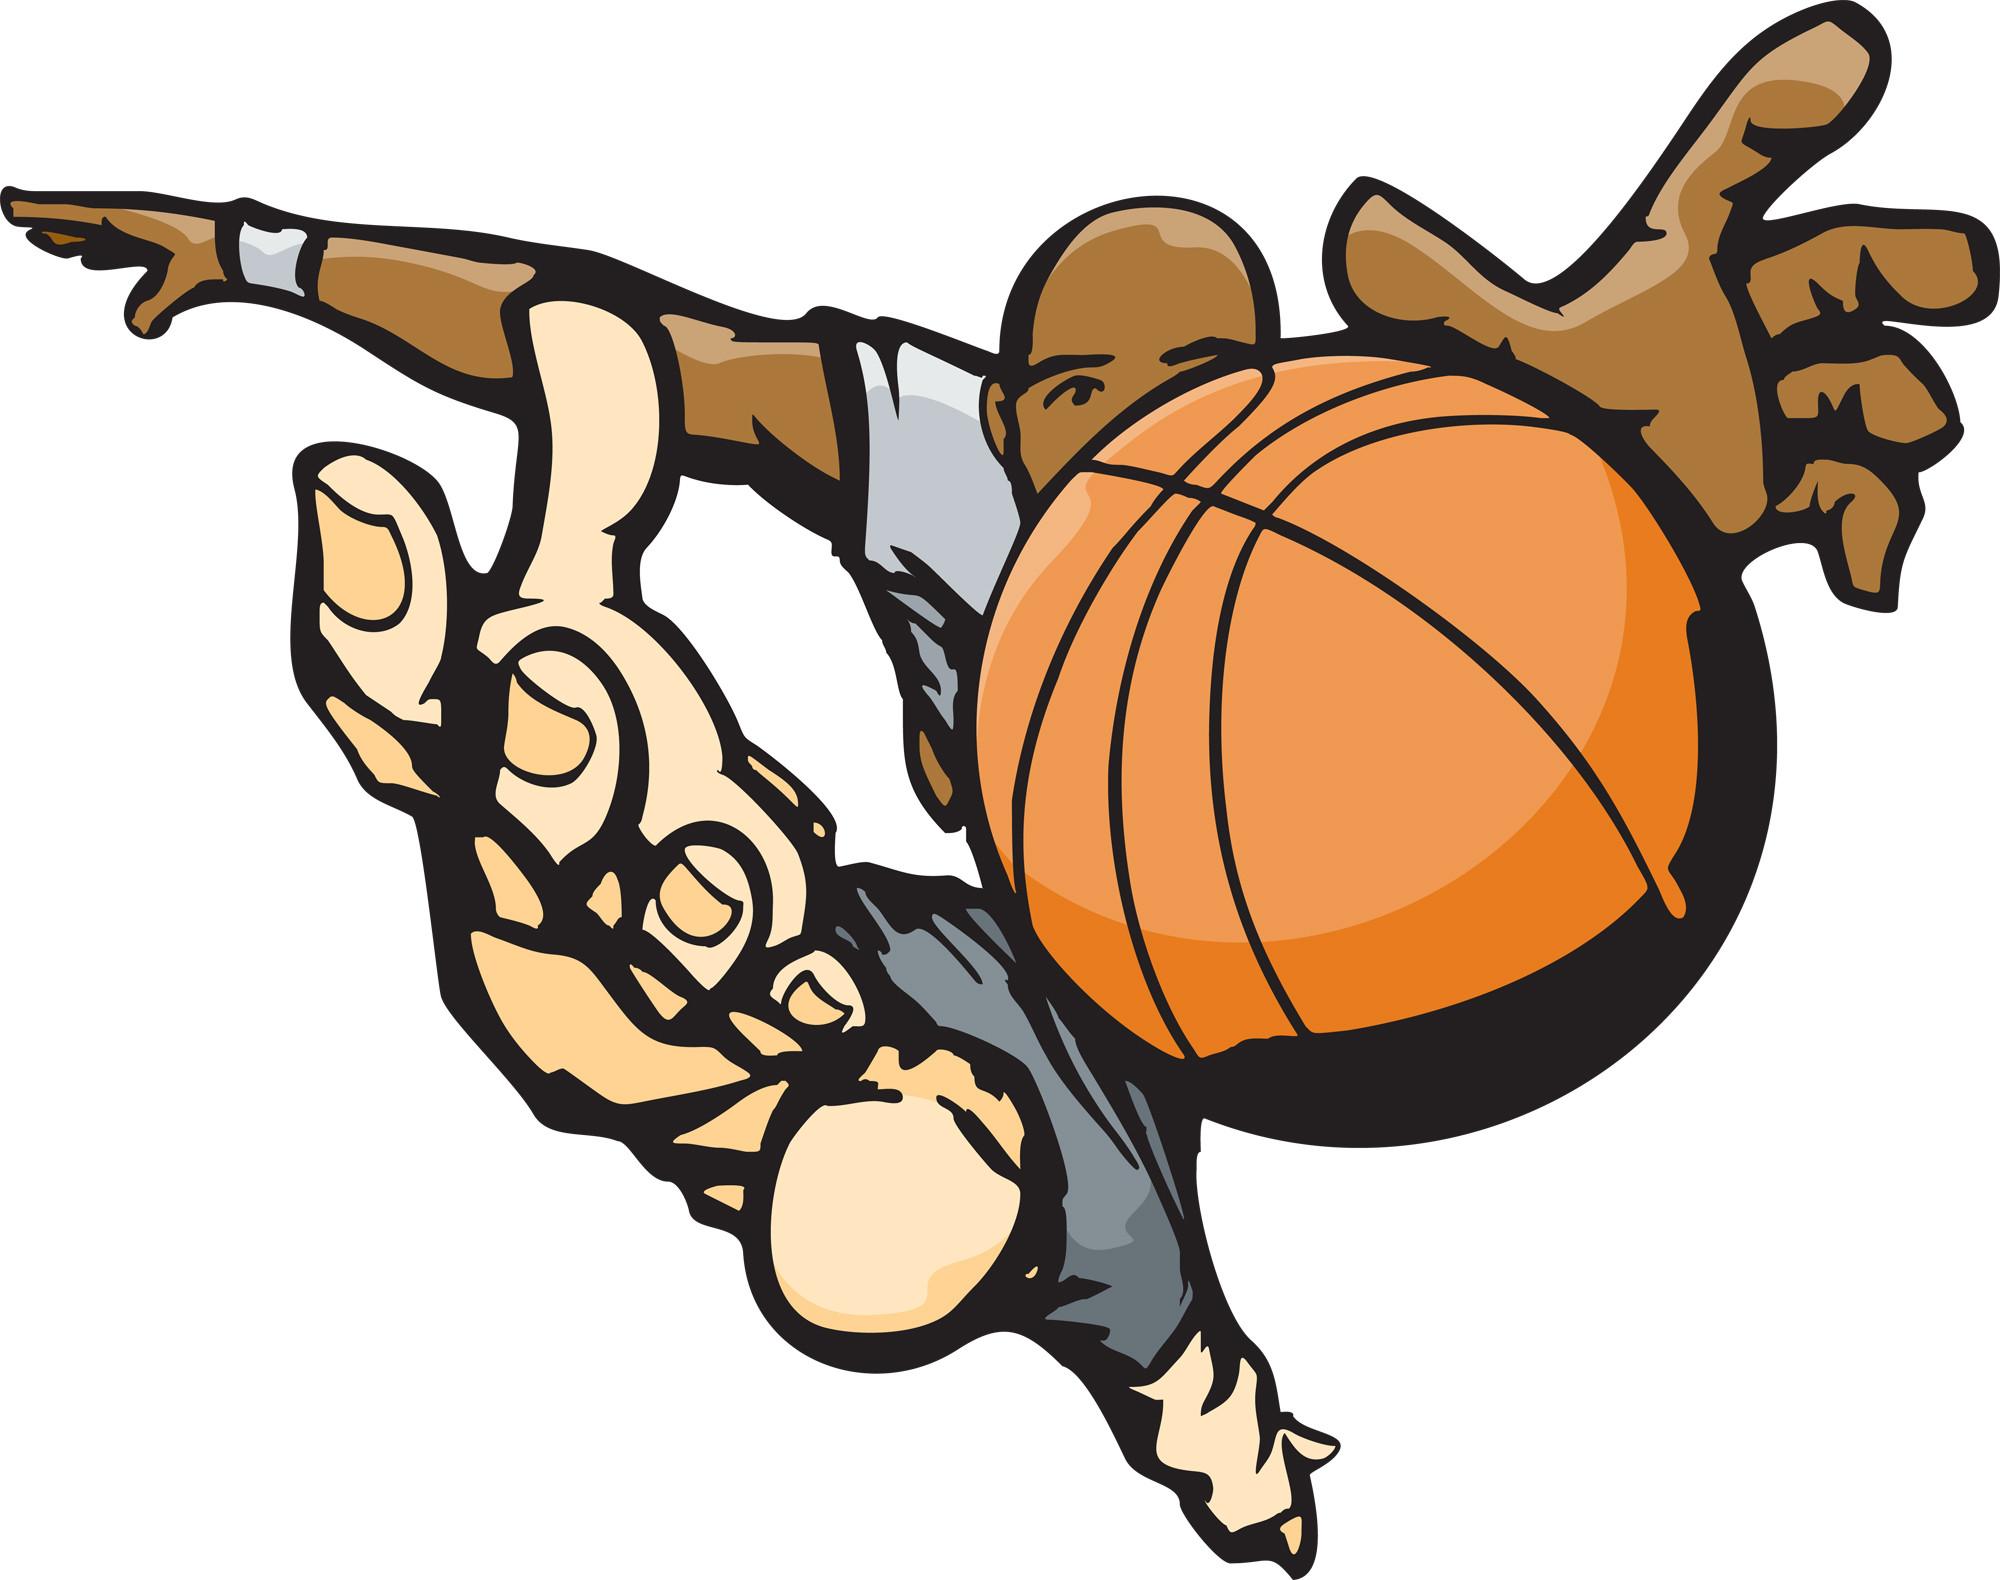 hight resolution of 2000x1580 symbolic flaming basketball ball royalty free vector clip art